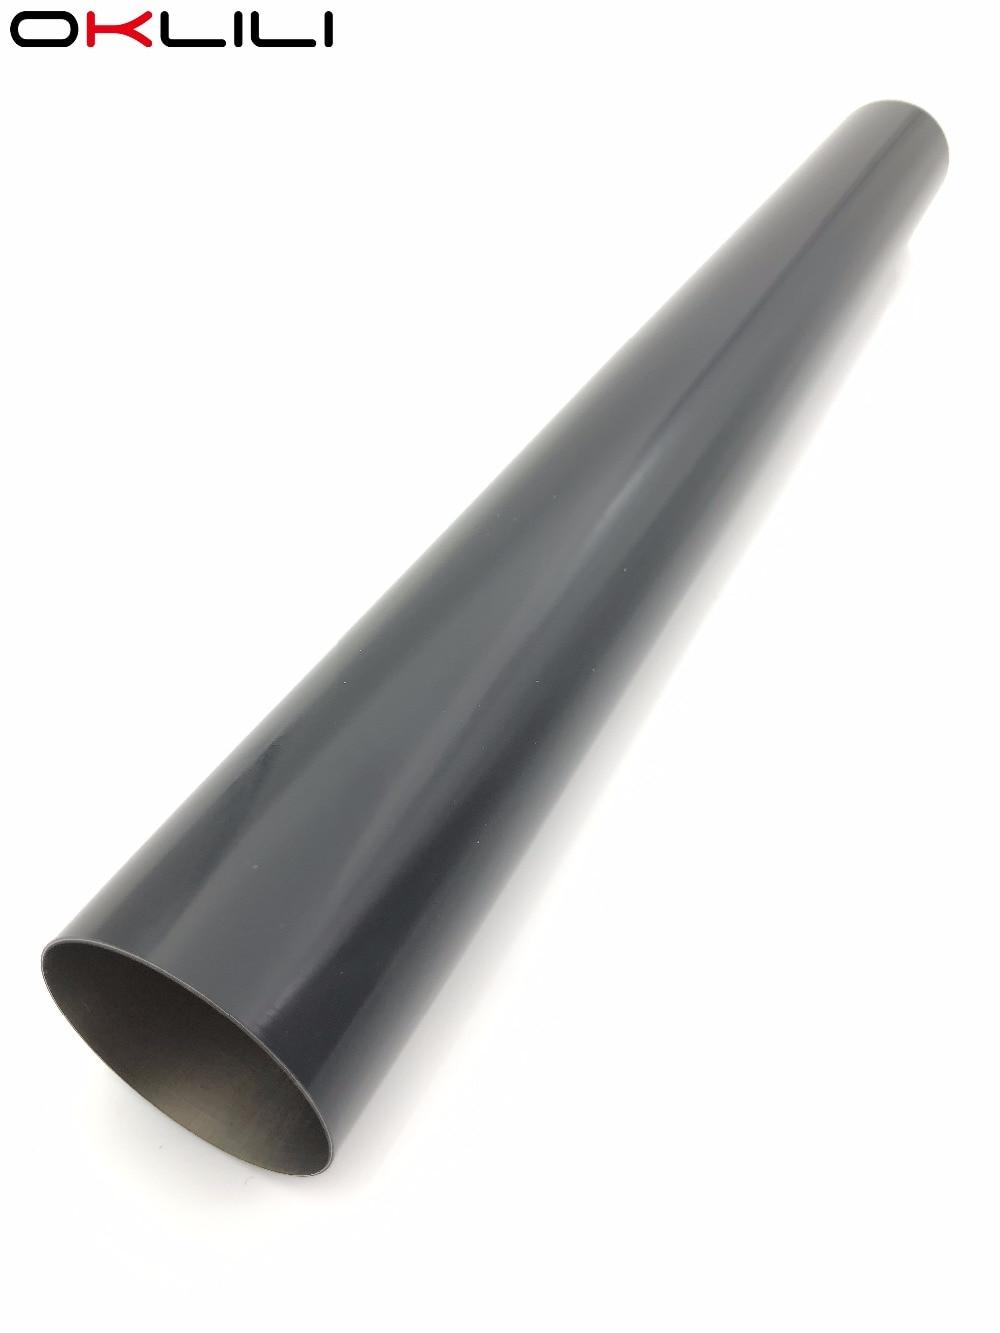 5X JAPAN 302RV93050 2RV93050 FK 1150 Fuser Fixing Film Sleeve for Kyocera ECOSYS P2040 P2235 M2040